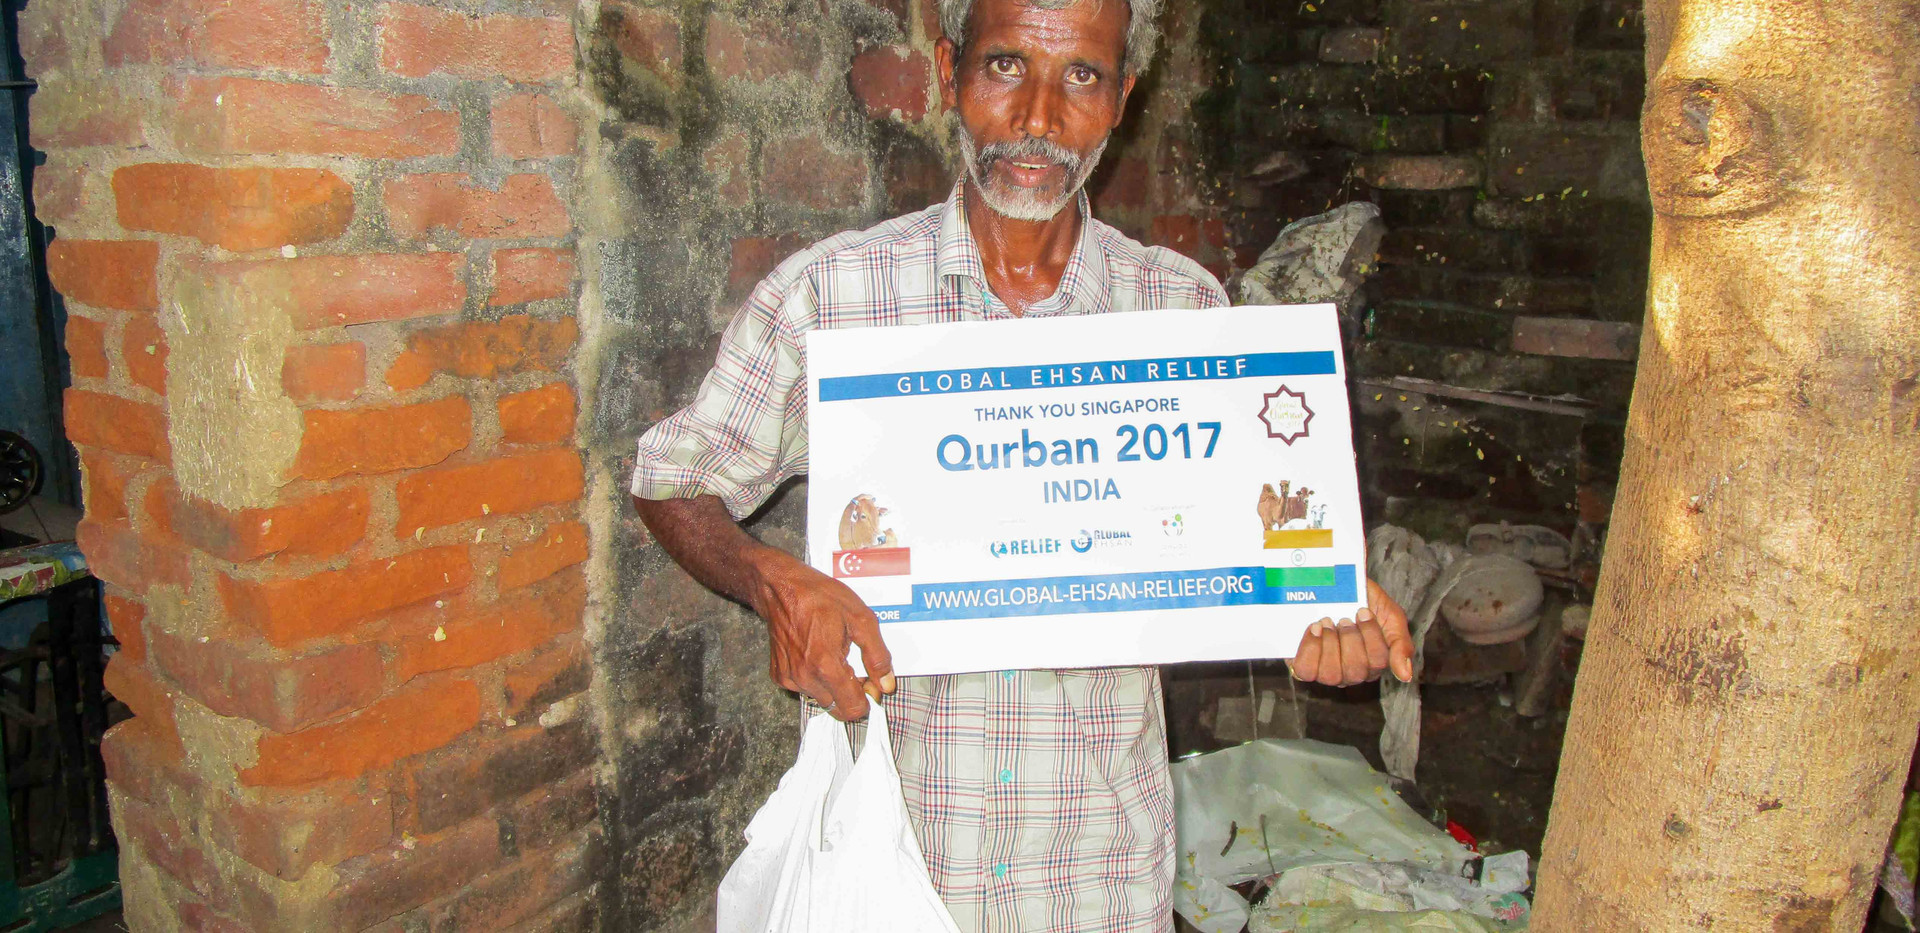 Qurban in India 2017